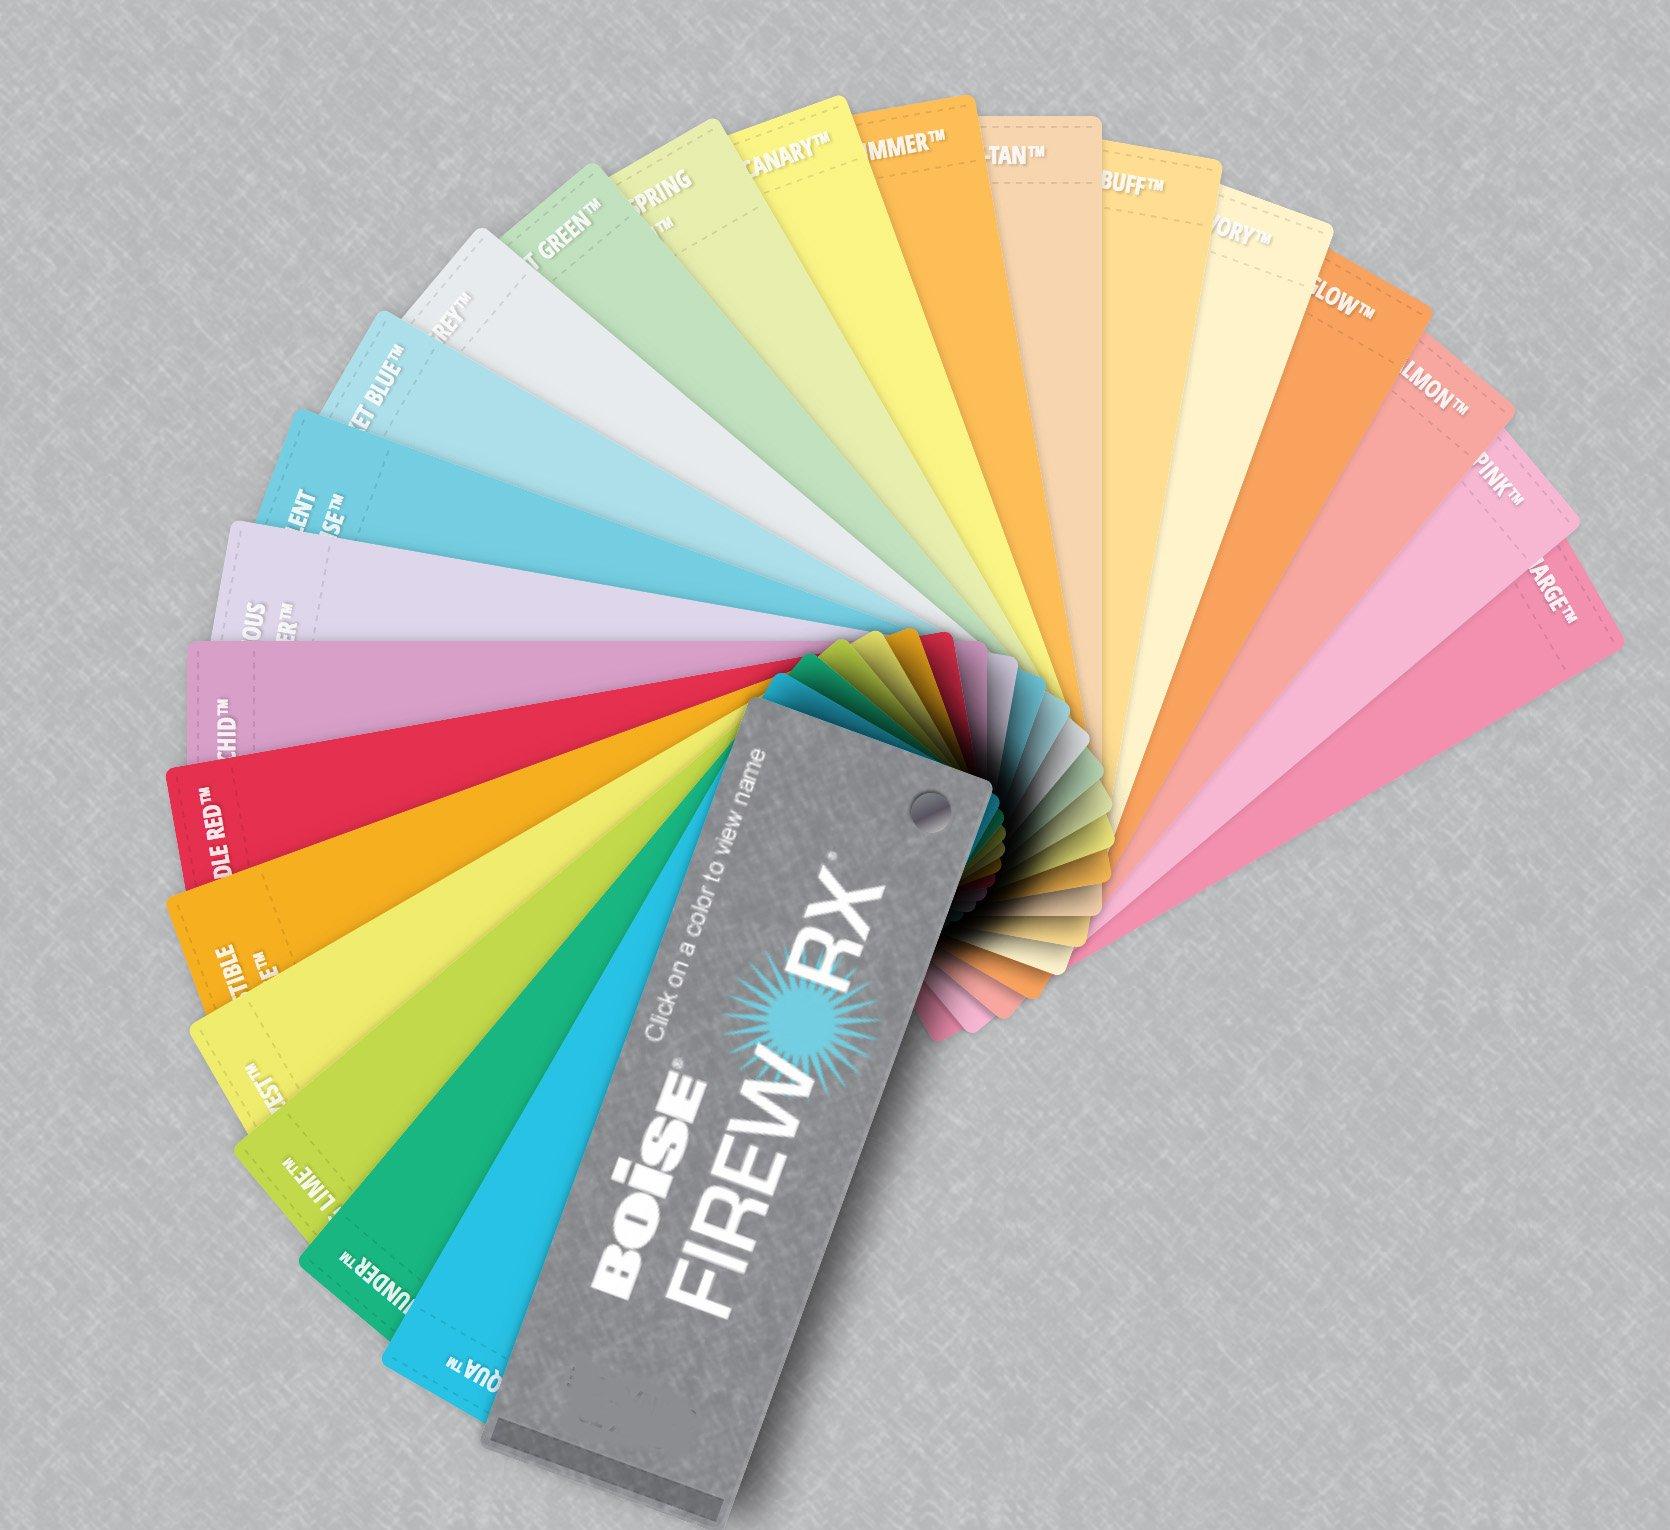 BOISE FIREWORX Premium Multi-Use Colored Paper, 8.5 x 14, Golden Glimmer, 20 lb, 10 ream carton (5,000 Sheets) by Boise Paper (Image #5)